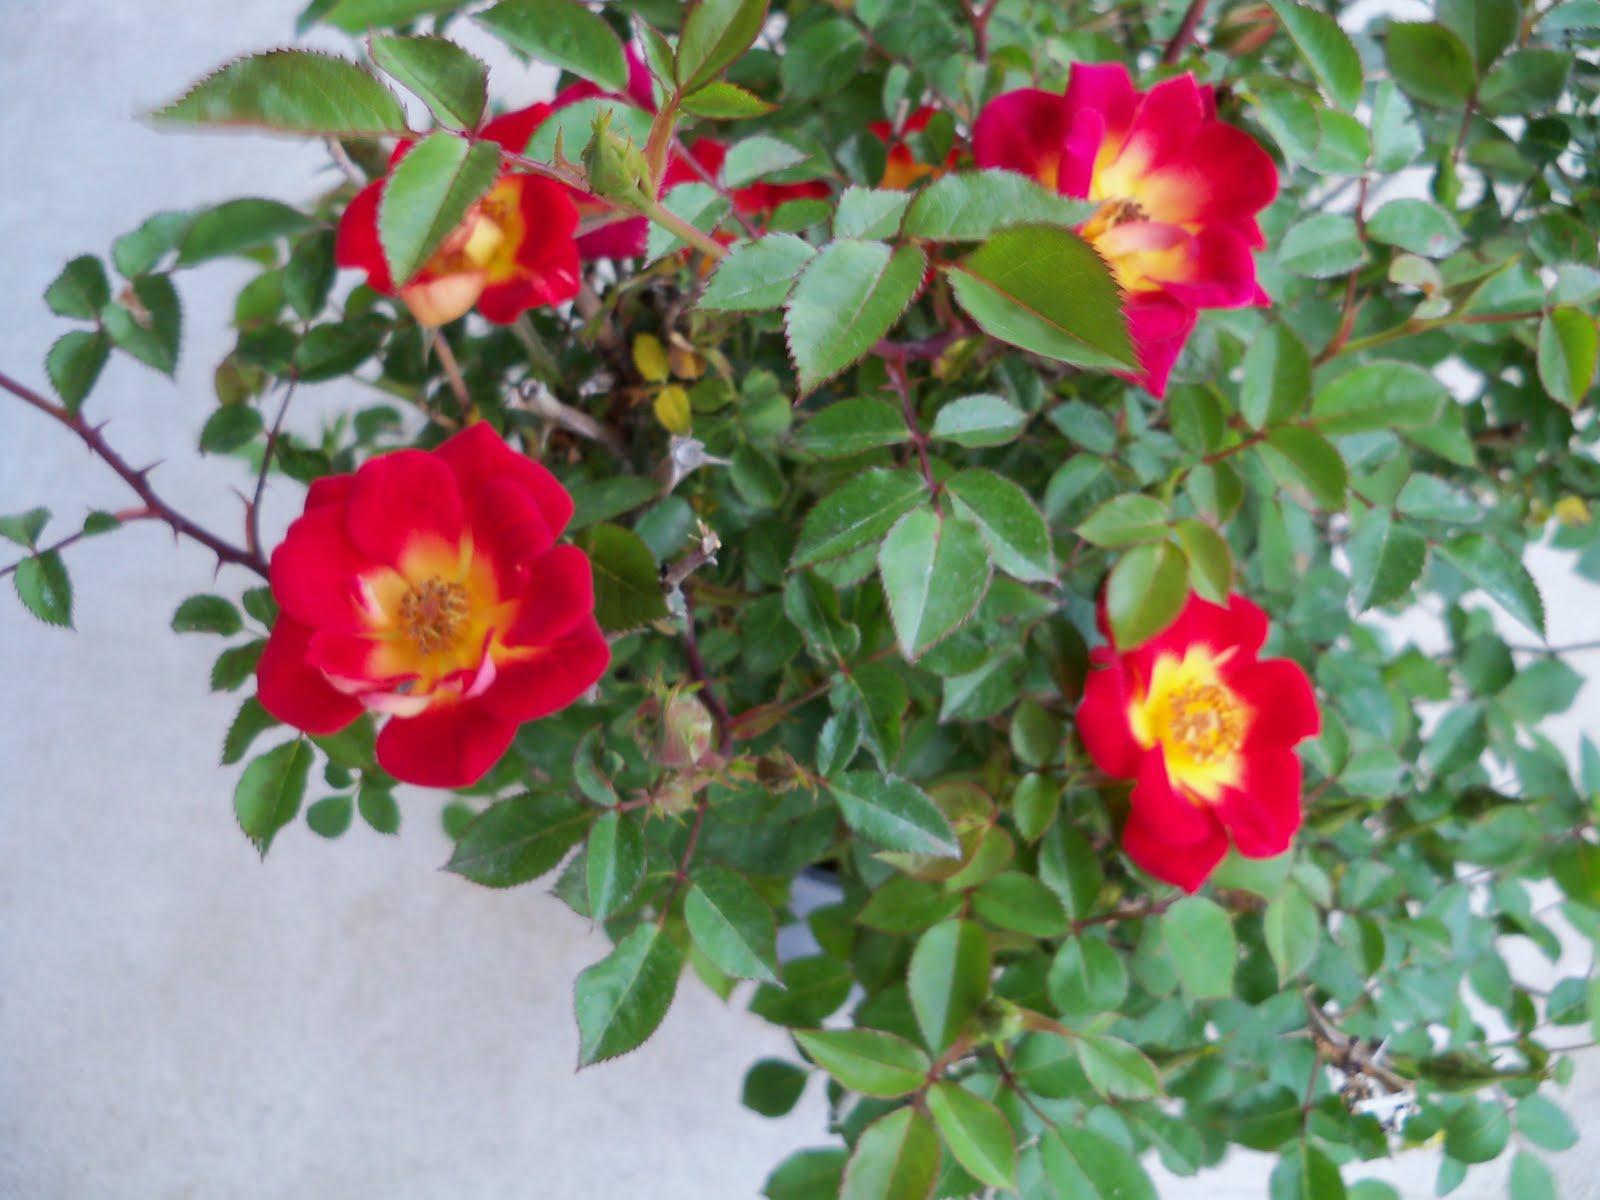 Gardening 2010 - 101_0723.JPG